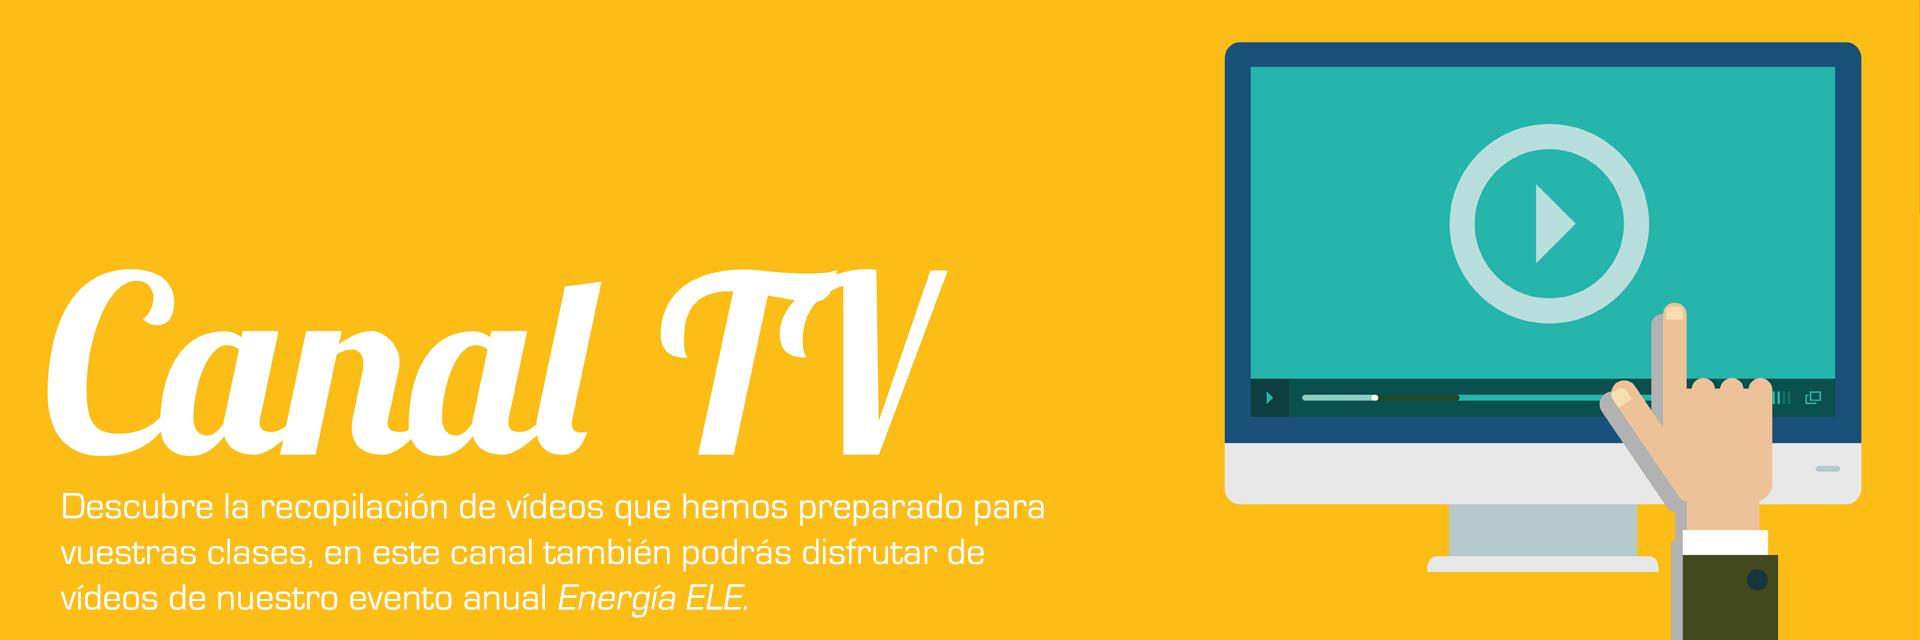 Canal tv Edelsa | Español lengua extranjera